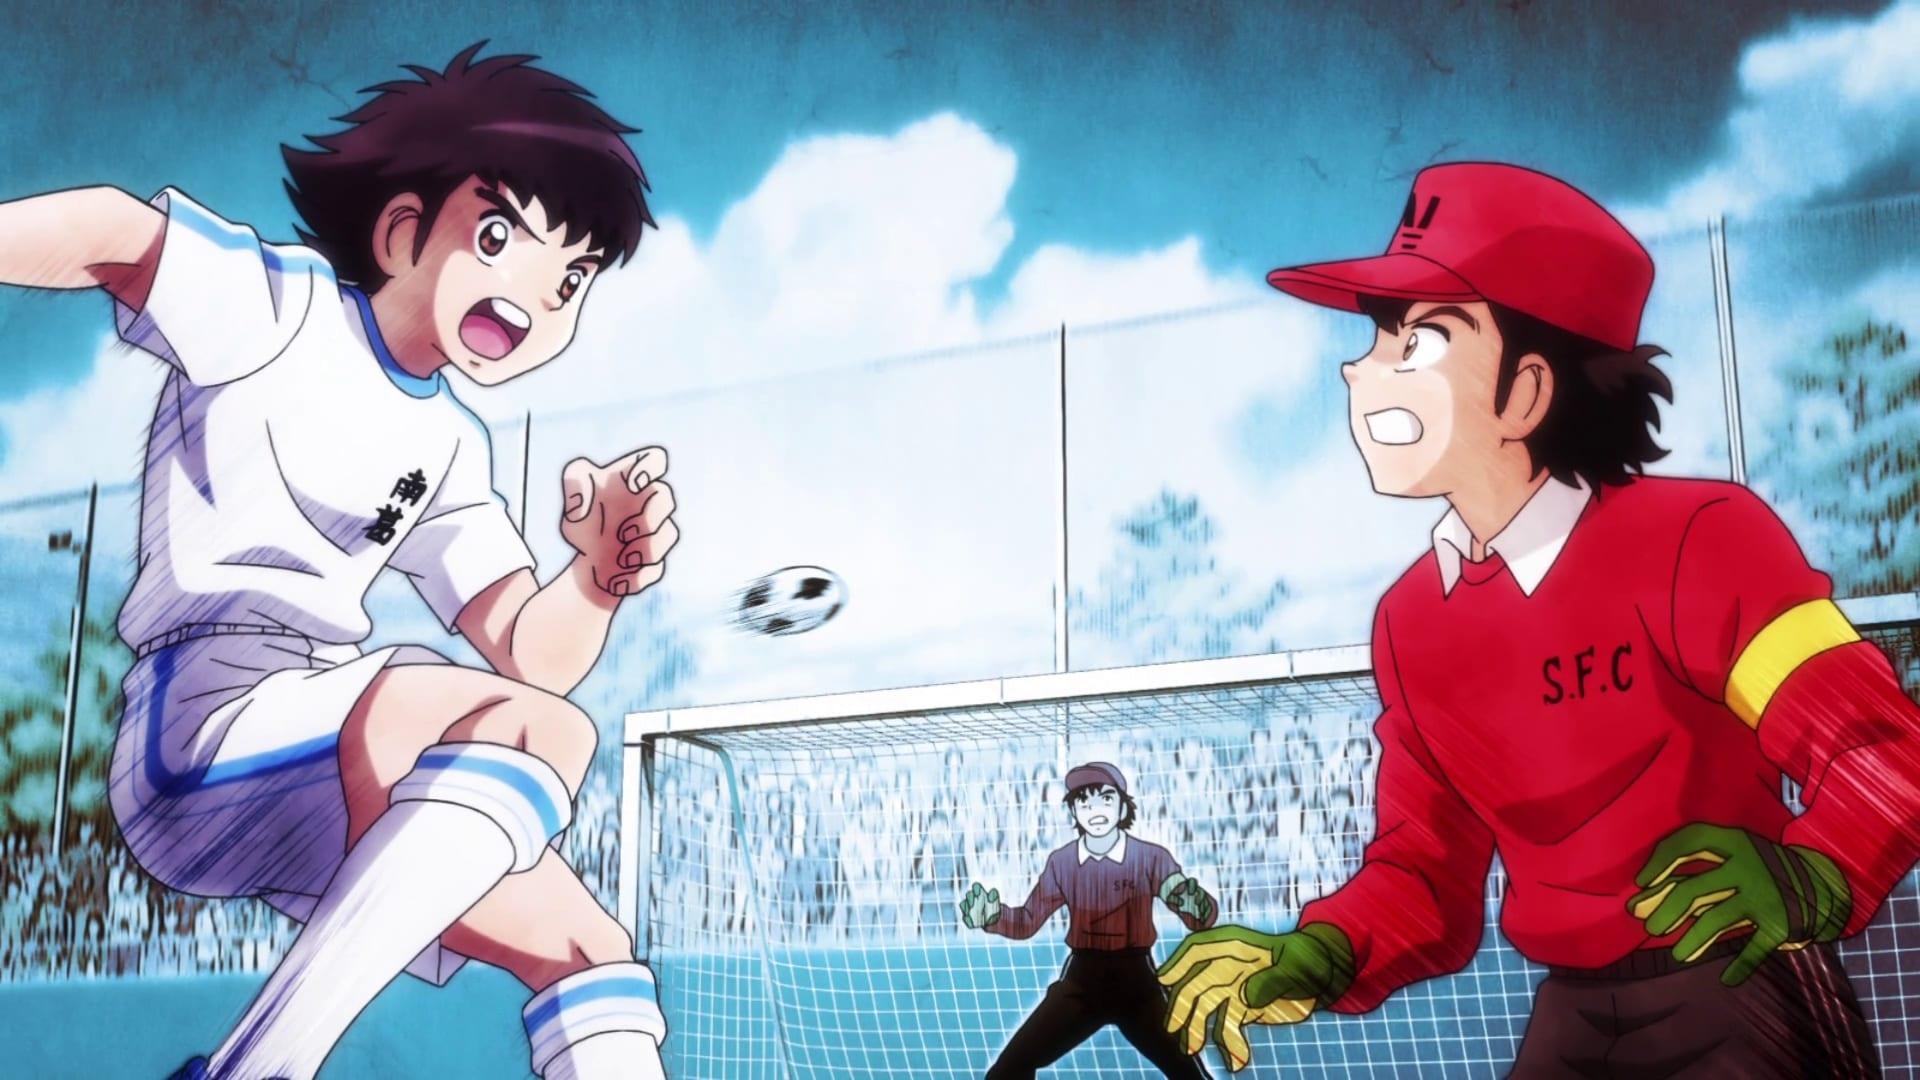 Captain Tsubasa Fantasista Tsubasa 2018 Backdrops Stills